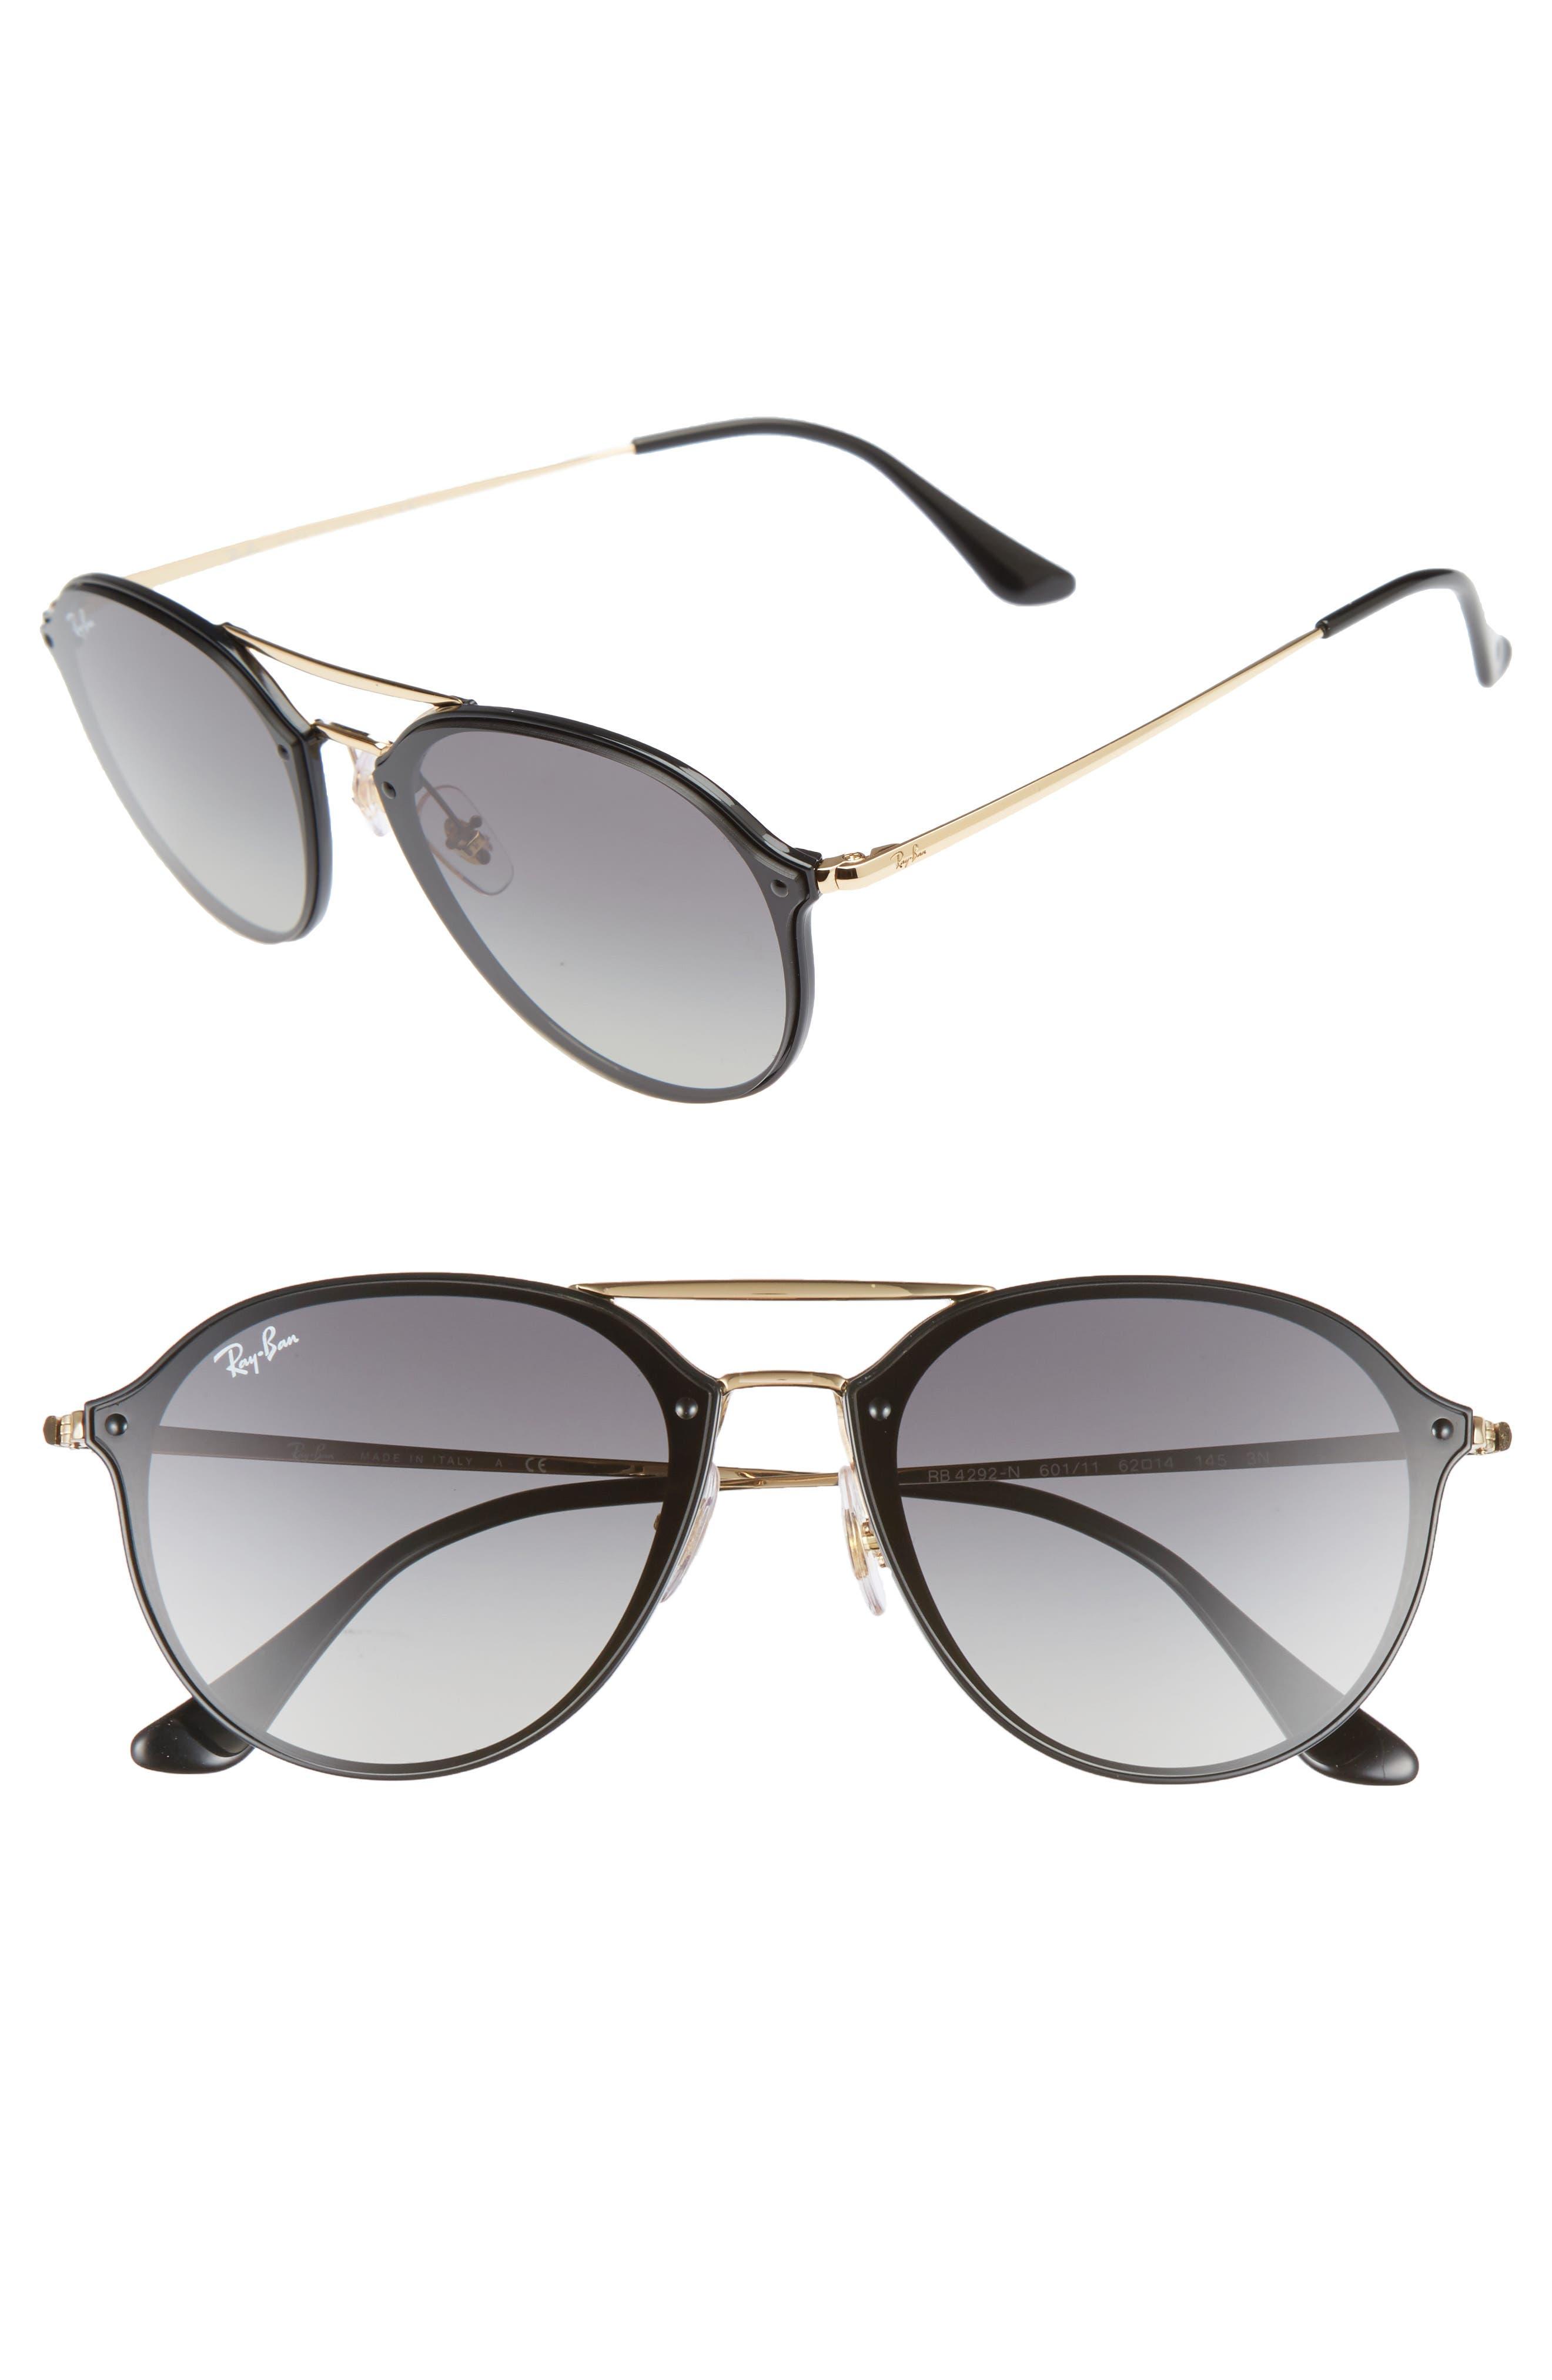 62mm Gradient Lens Aviator Sunglasses,                         Main,                         color, Black